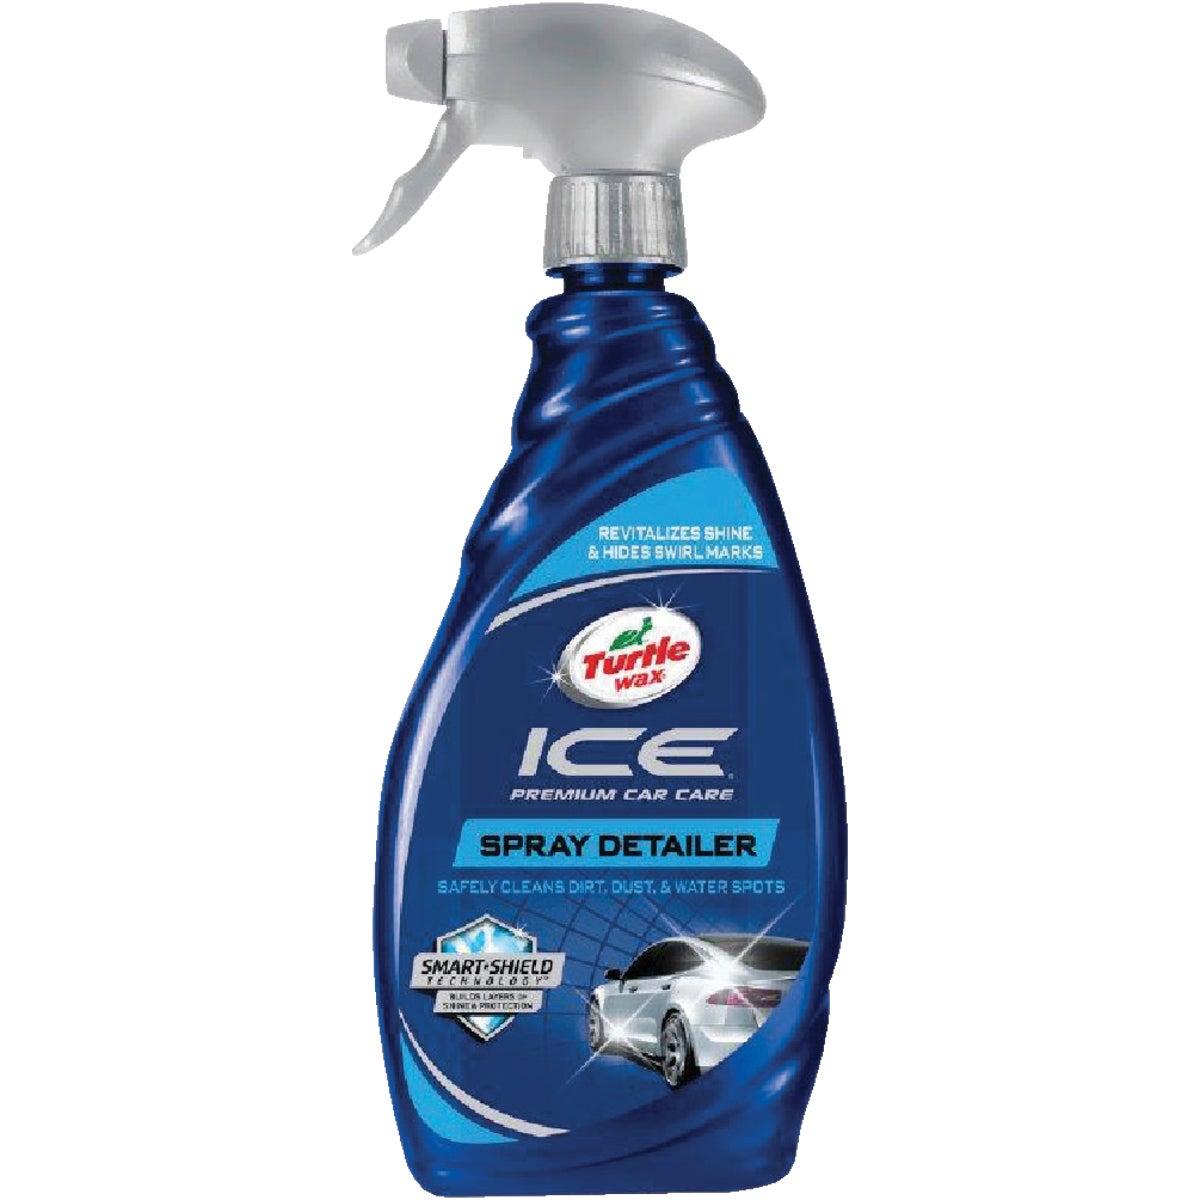 Spray Detailer